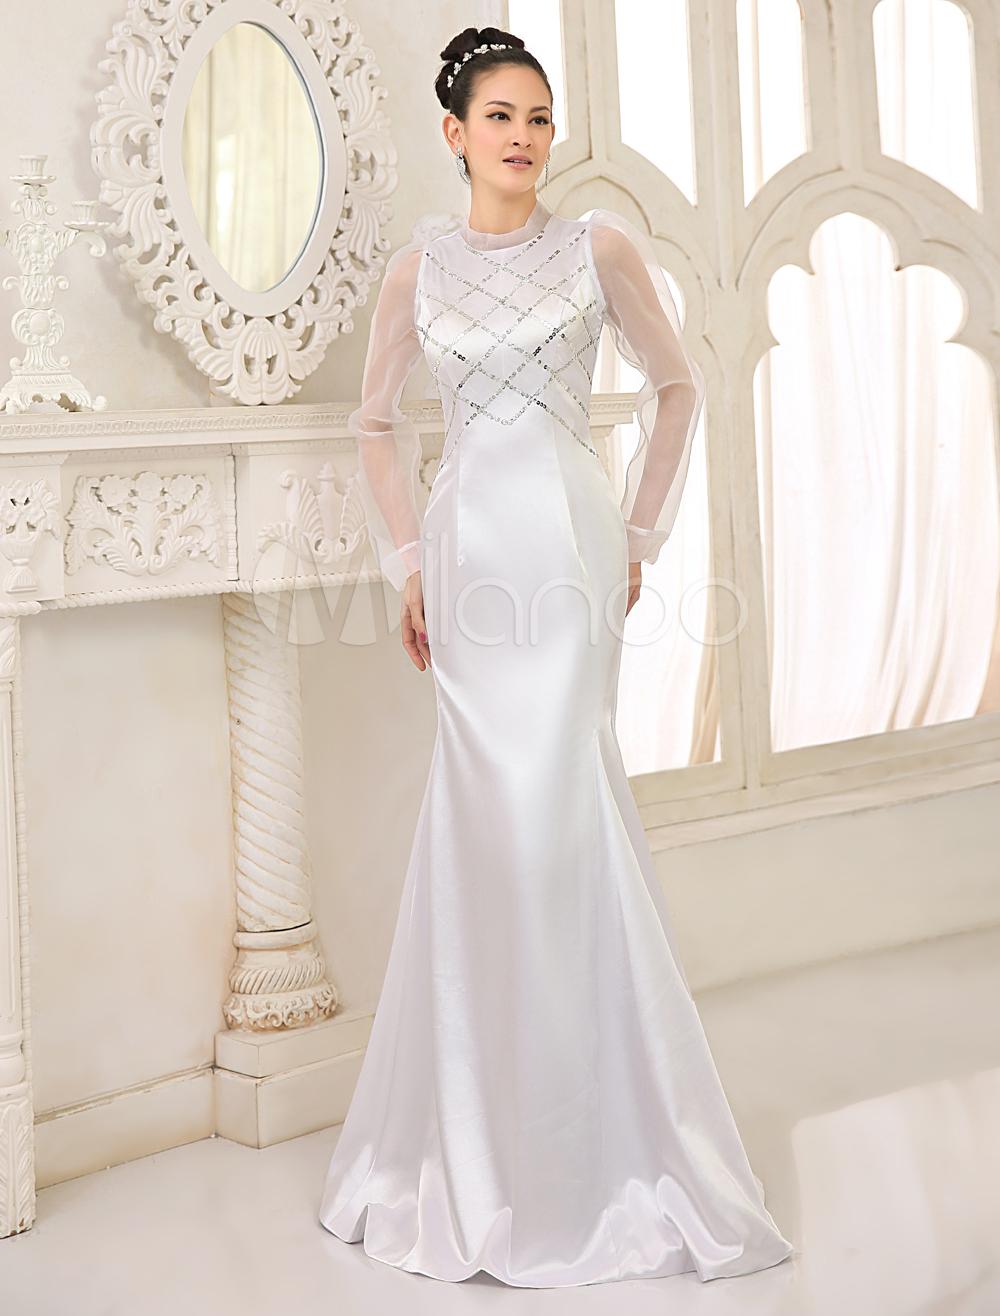 White Satin Sleeveless Ladies Evening Dress (Wedding Evening Dresses) photo